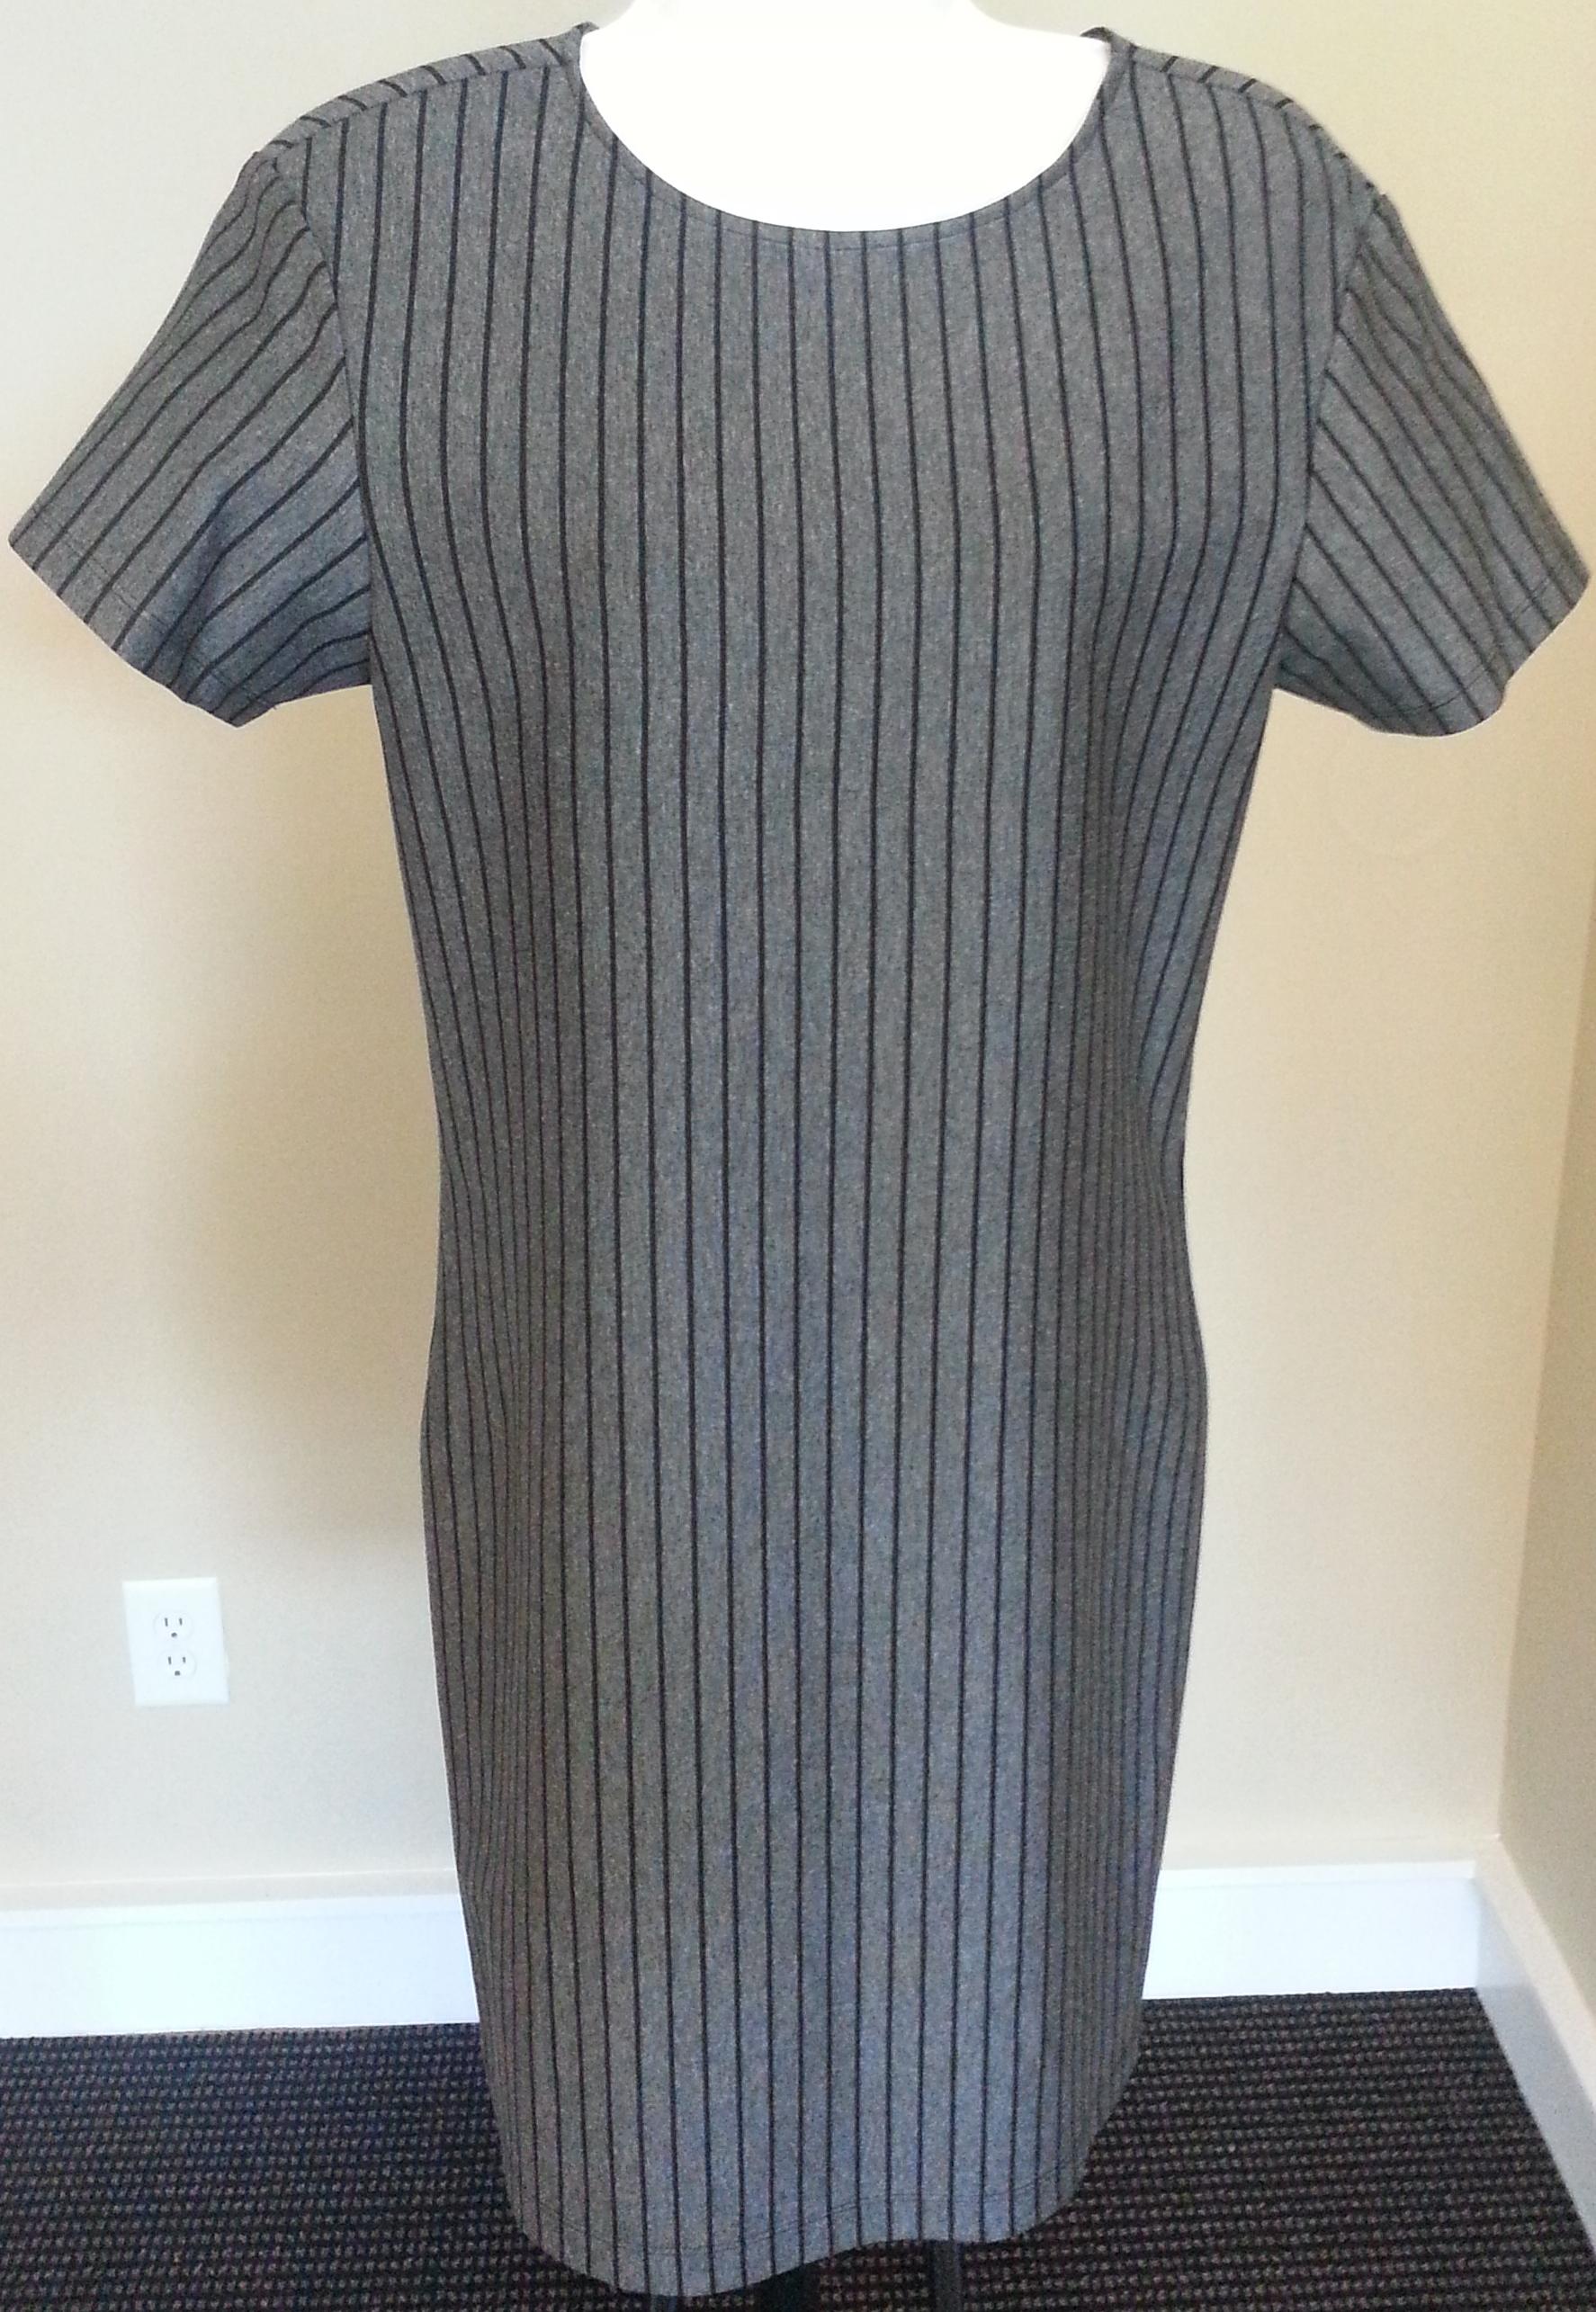 bf58886384 T Shirt Dress in Medium Grey with Black Pencil Stripes on Storenvy